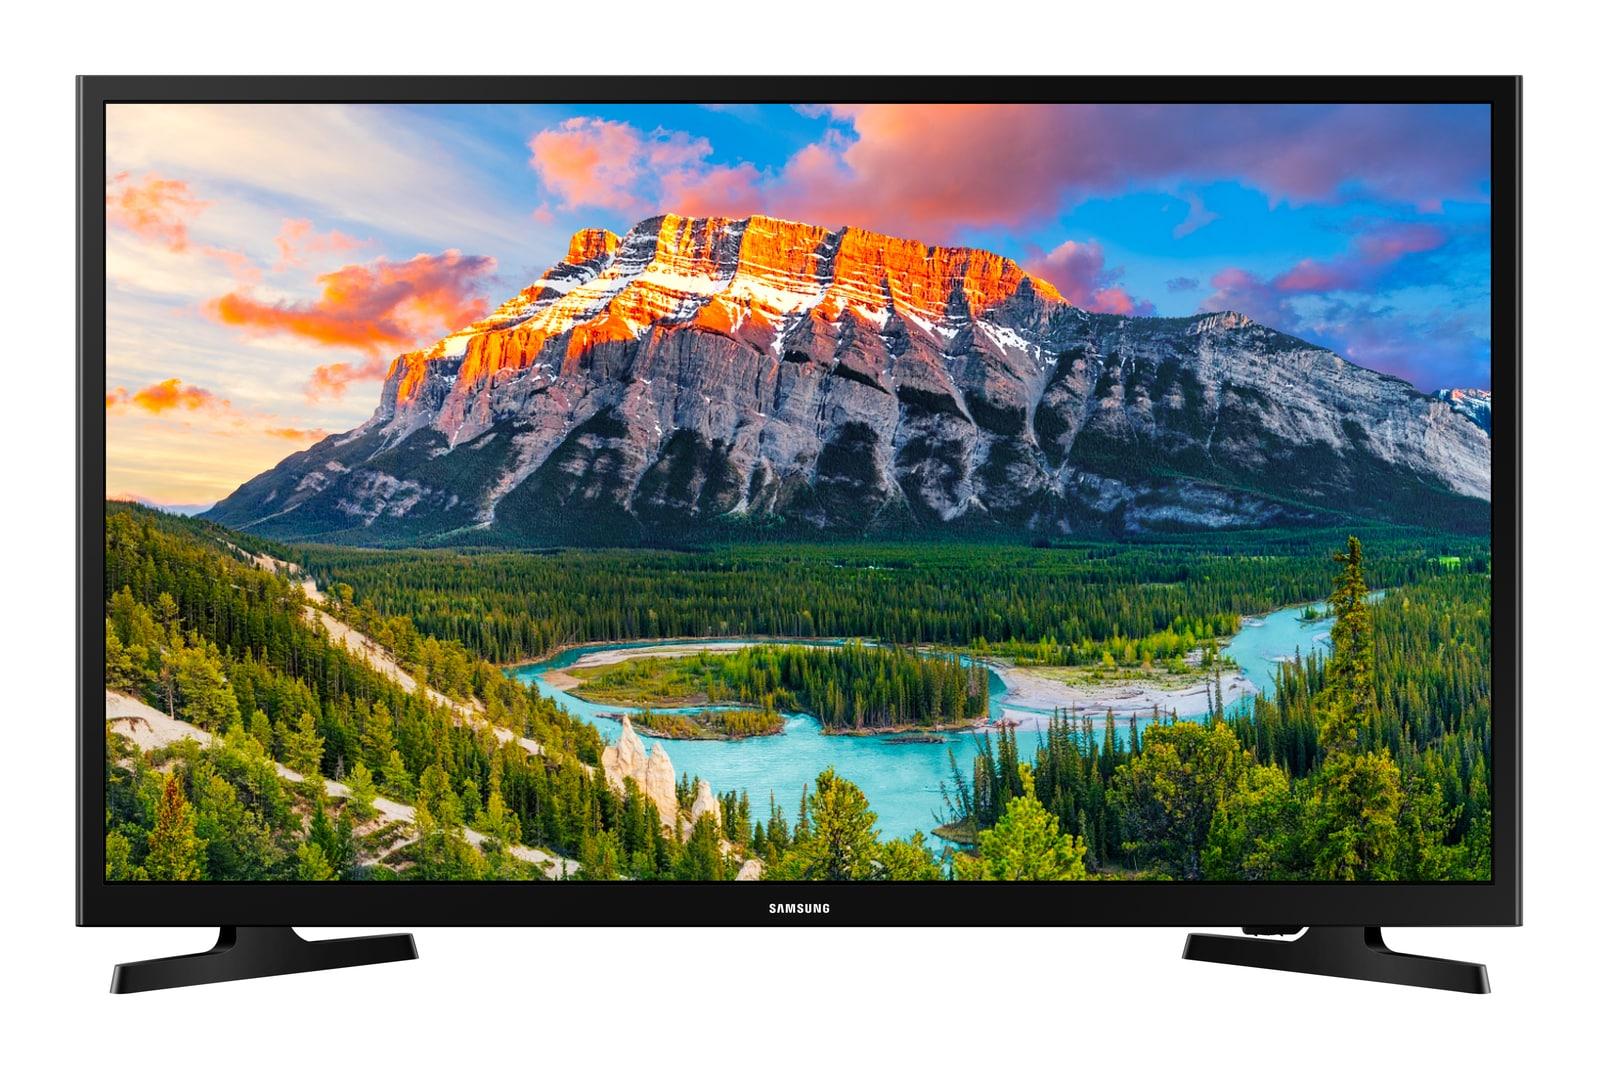 S Samsung TVs | Electronic Custom Distributors